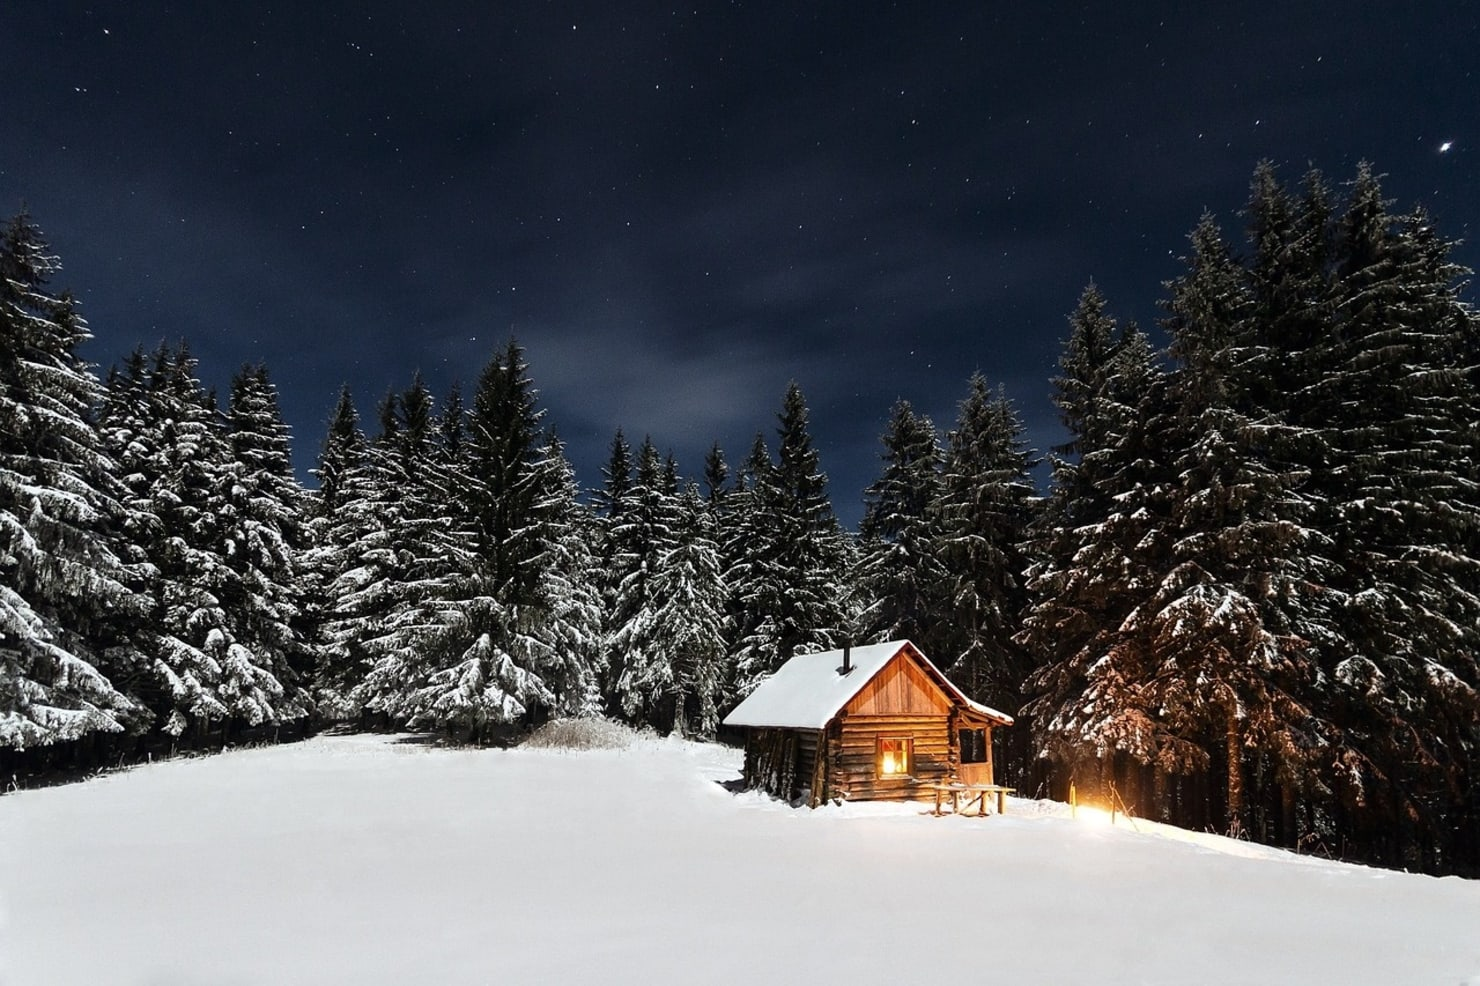 Потрясающий дом посреди леса